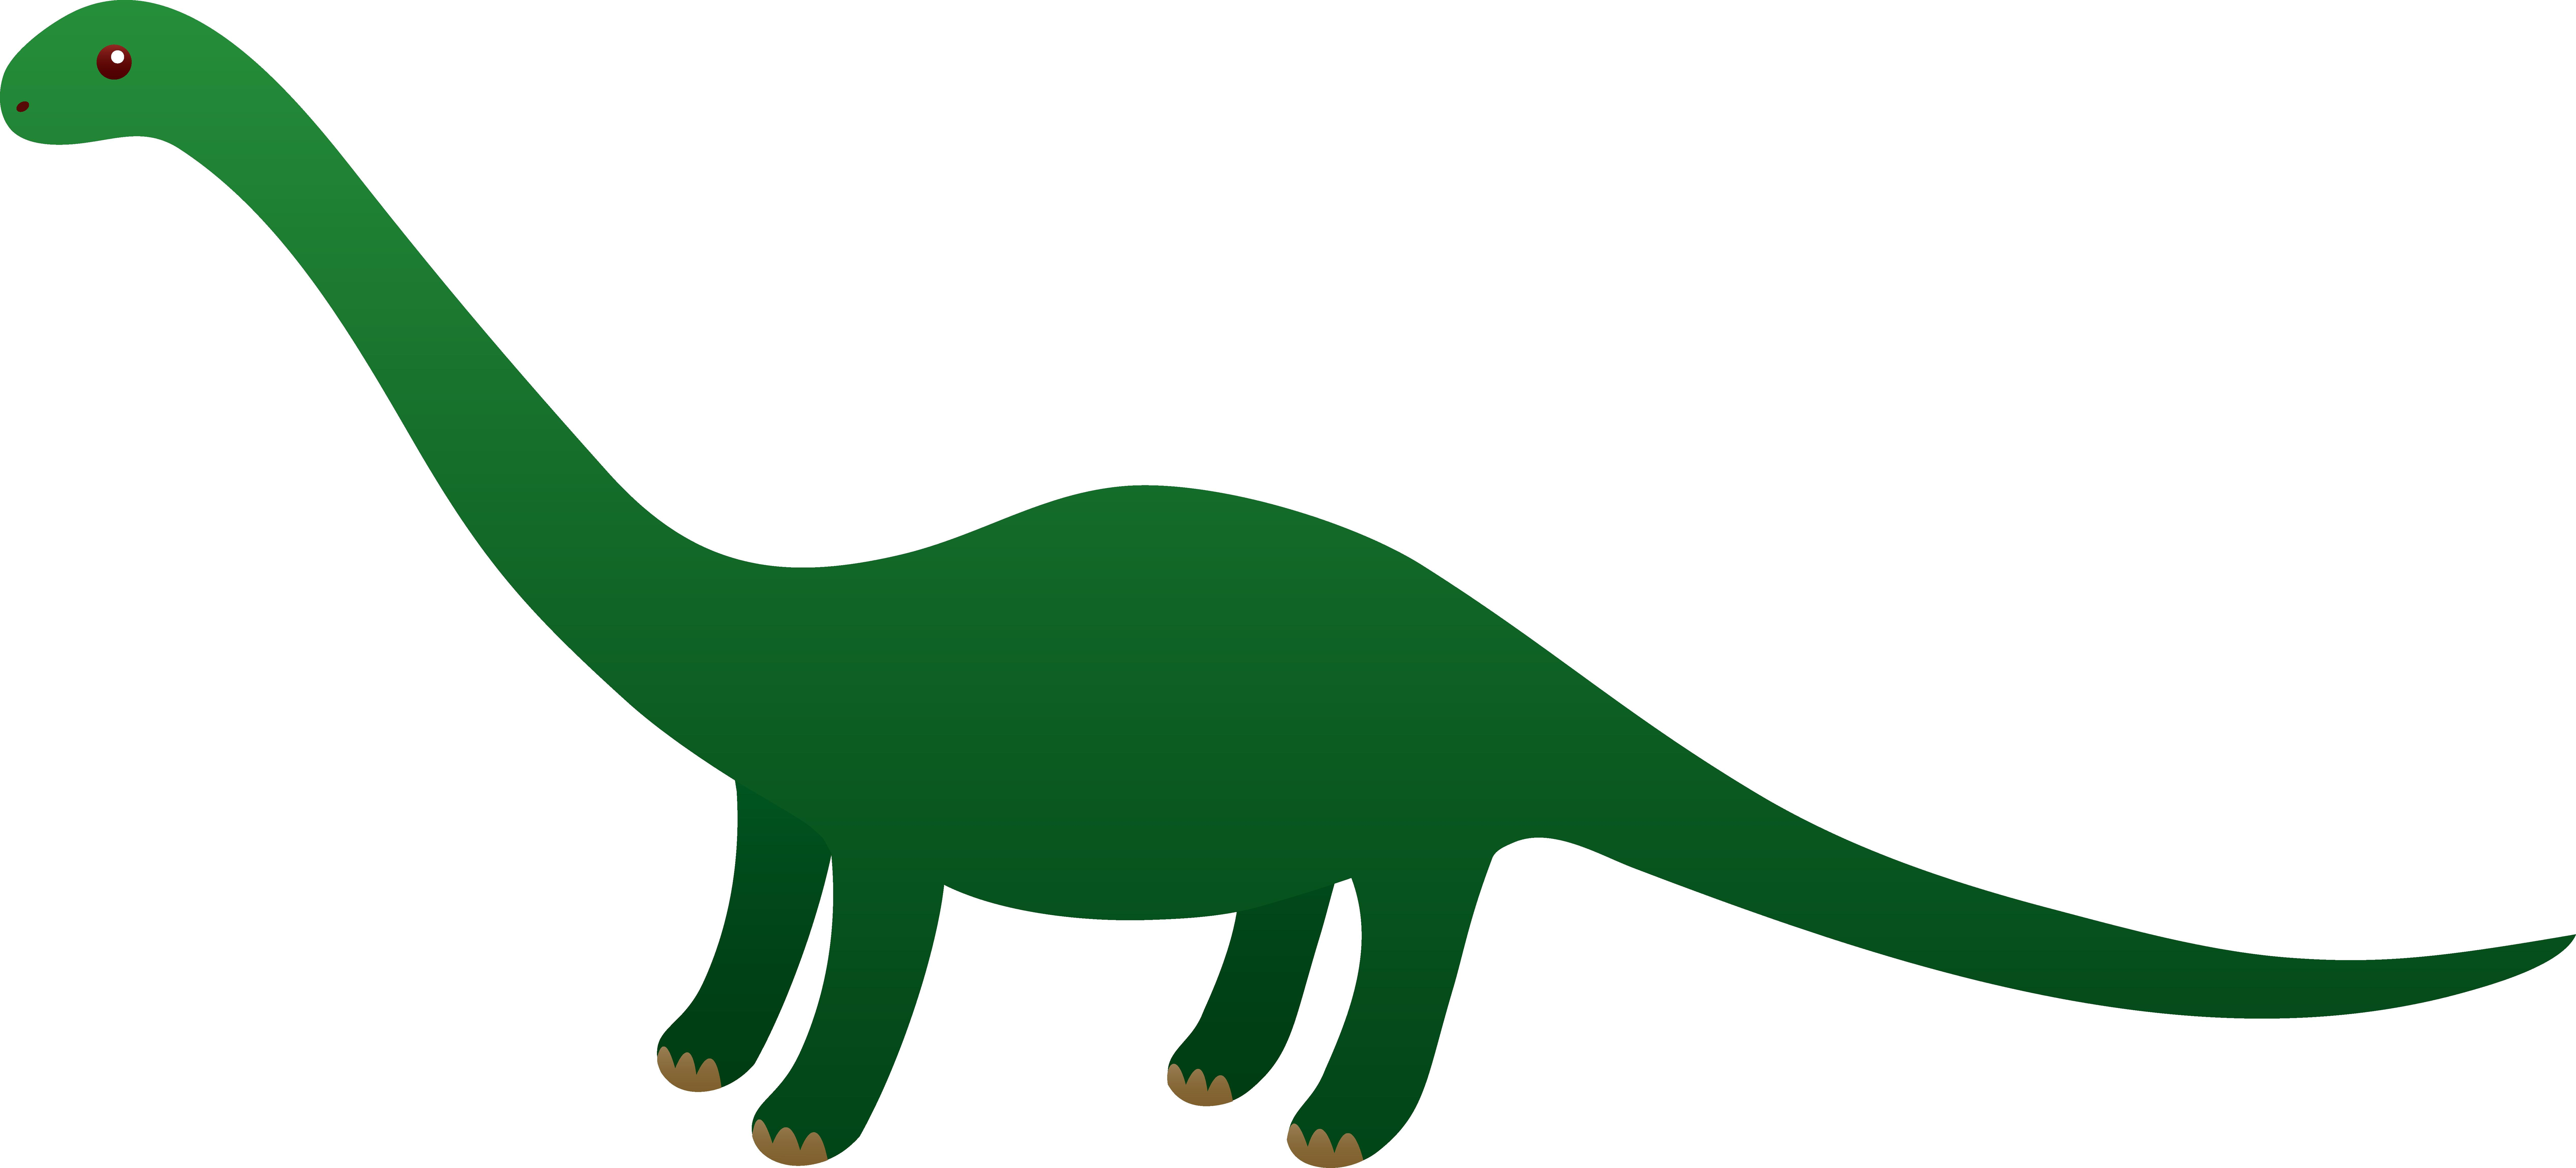 Brontosaurus or apatosaurus free. Dinosaur clipart simple